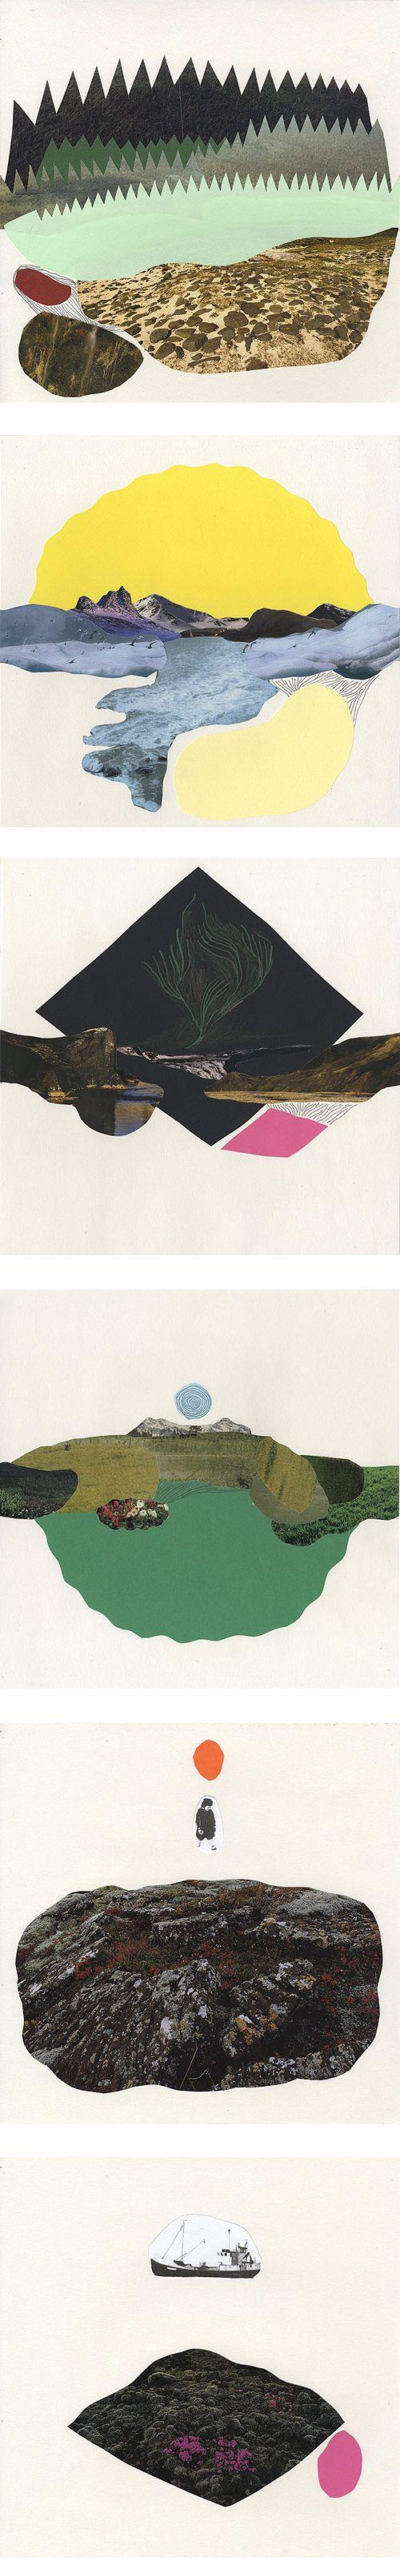 Tom-Edwards-collages